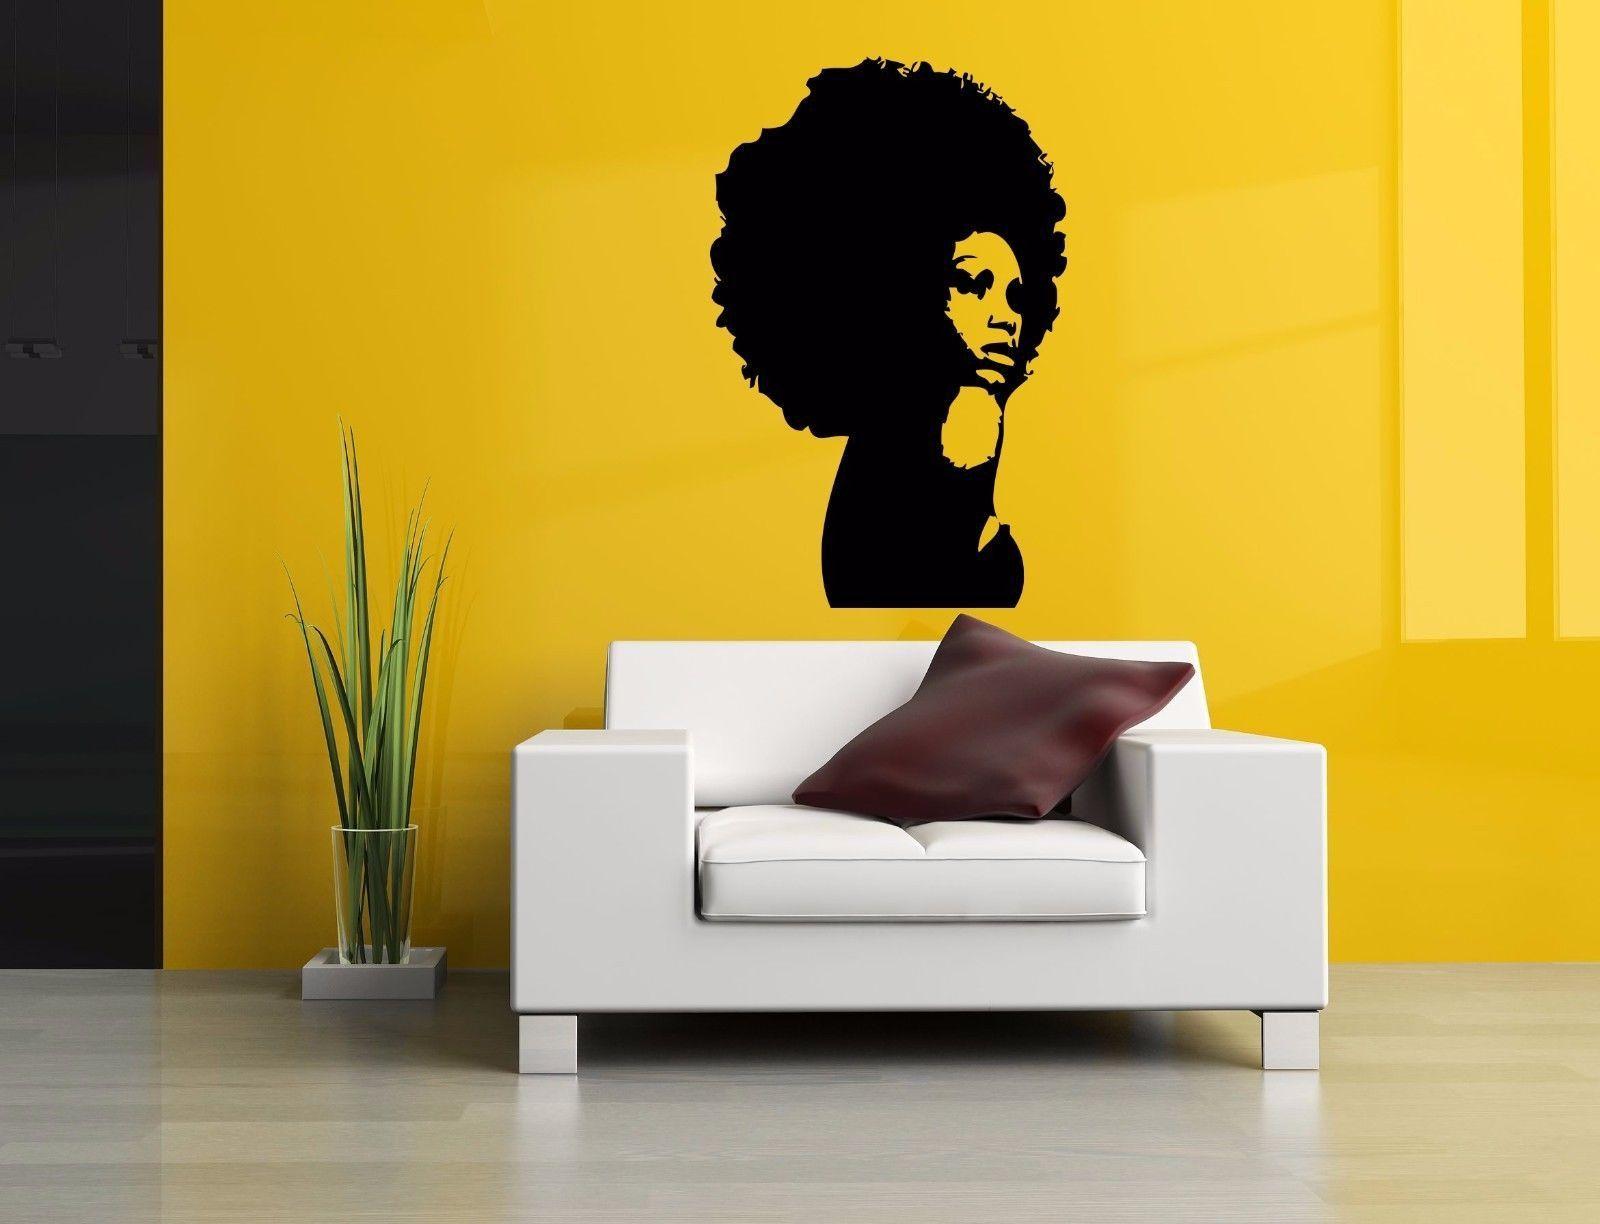 Wall Room Decor Art Vinyl Sticker Mural Decal Afro Girl Black Woman ...